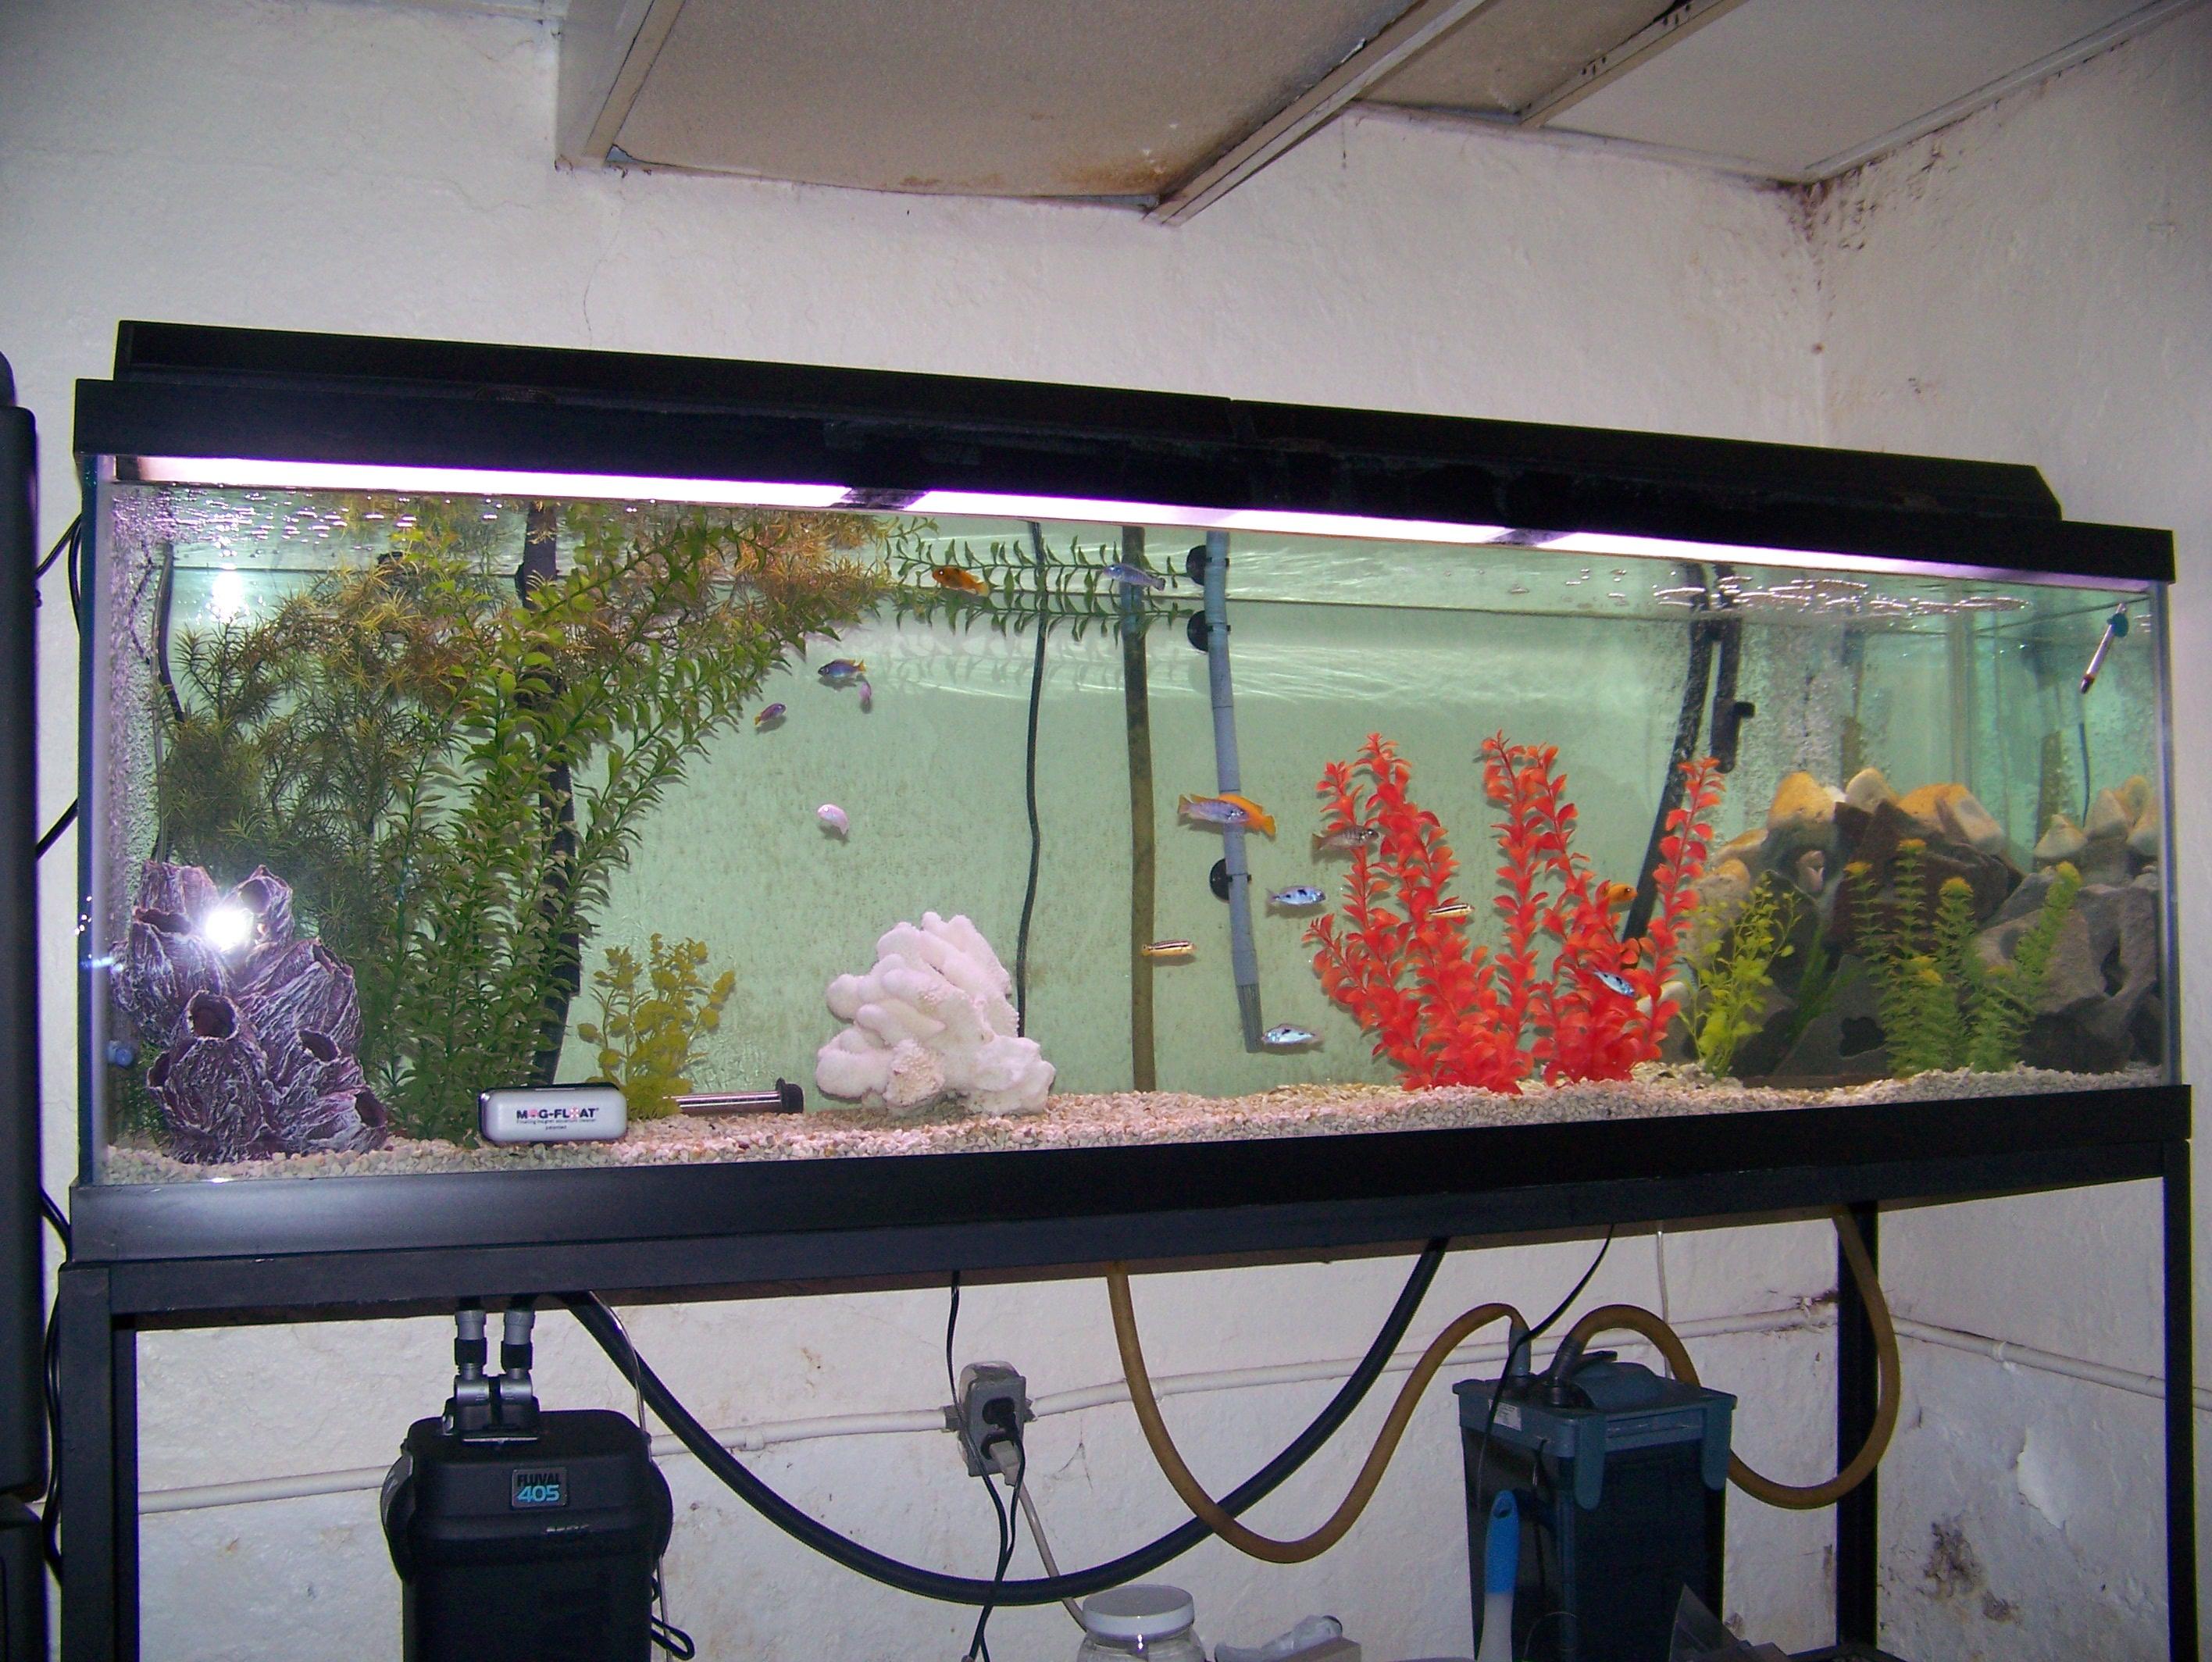 125 gallon aquarium stand plans 180 fish tank stand diy for 125 gallon fish tank stand